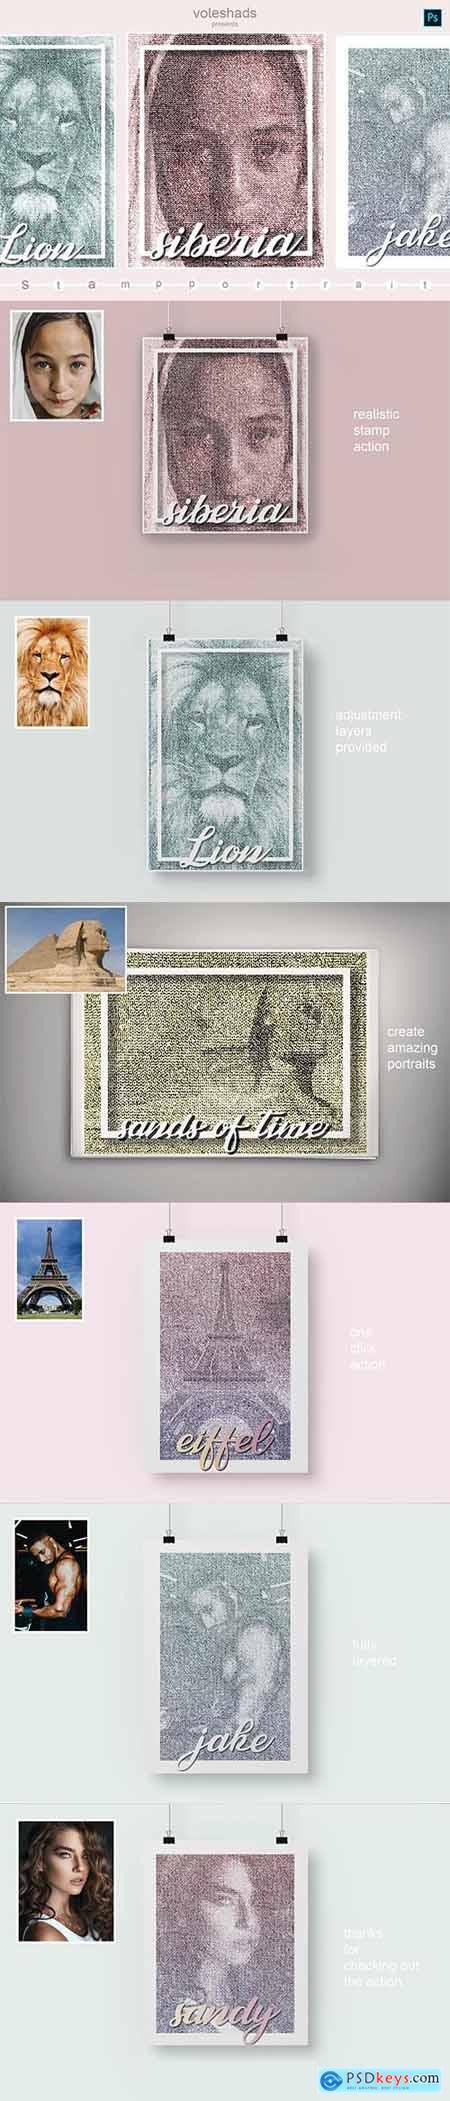 Stamp portrait Photoshop Action 5933908